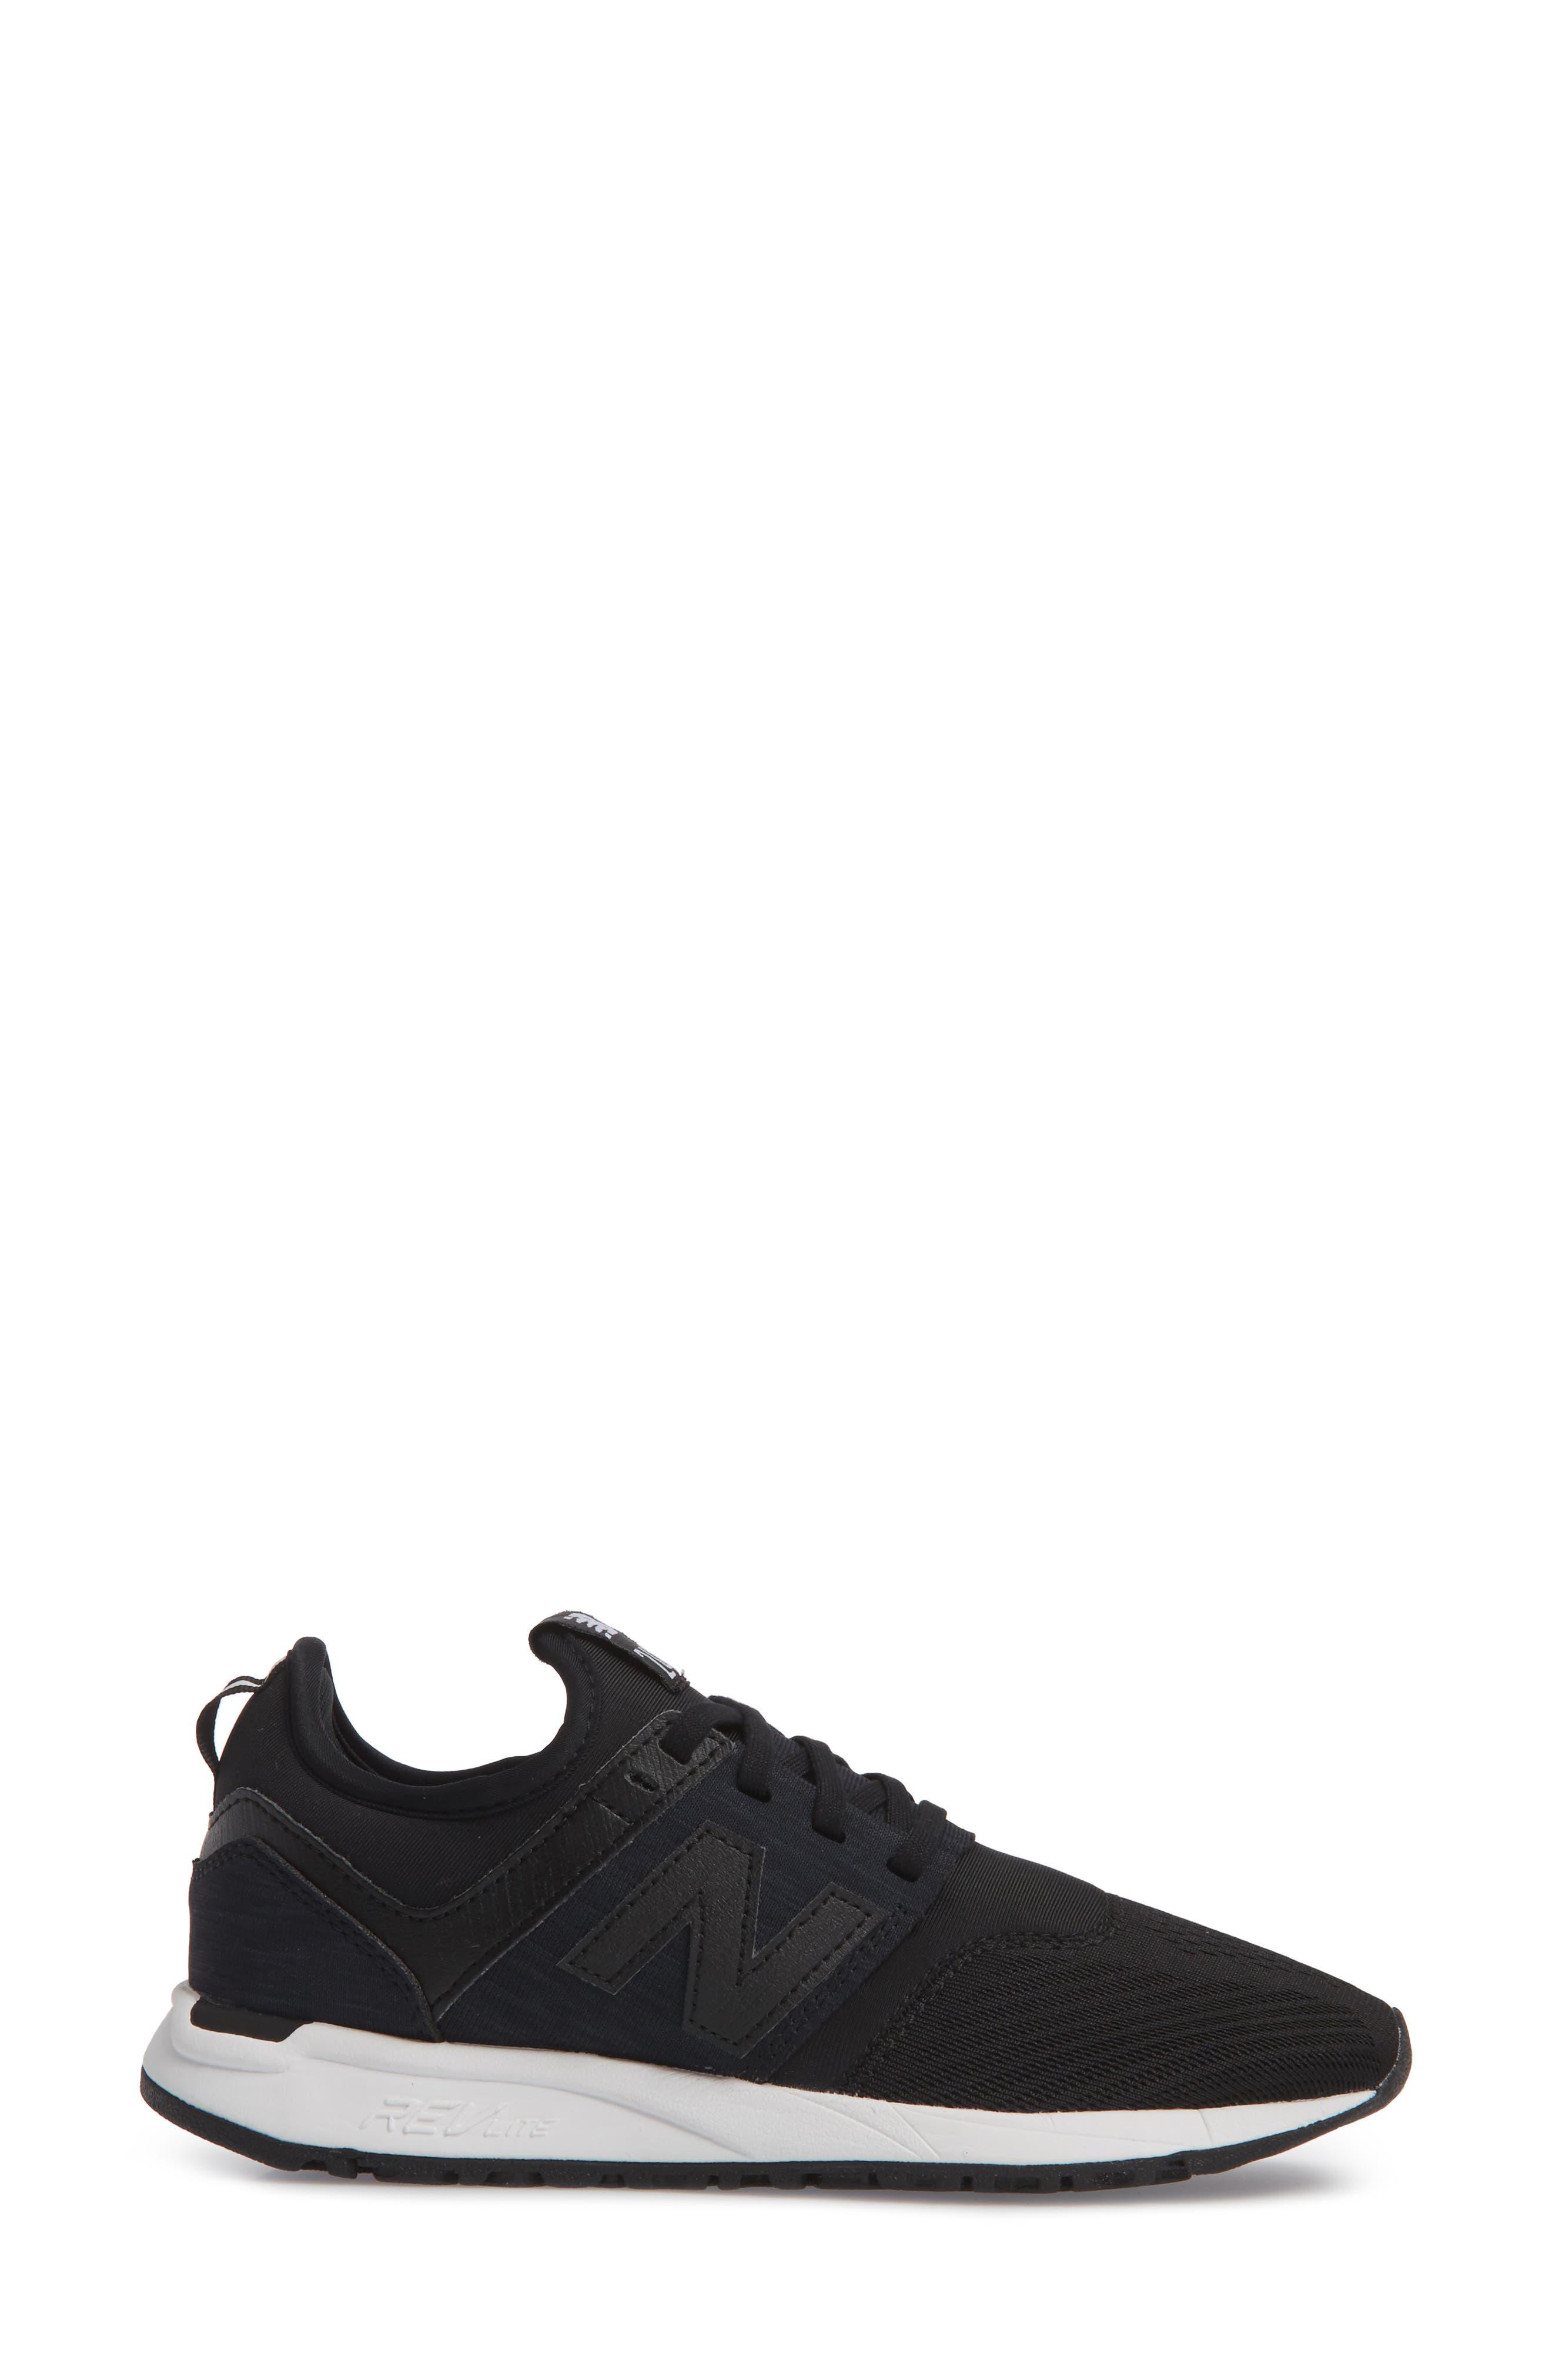 247 Classic Sneaker,                             Alternate thumbnail 3, color,                             Black